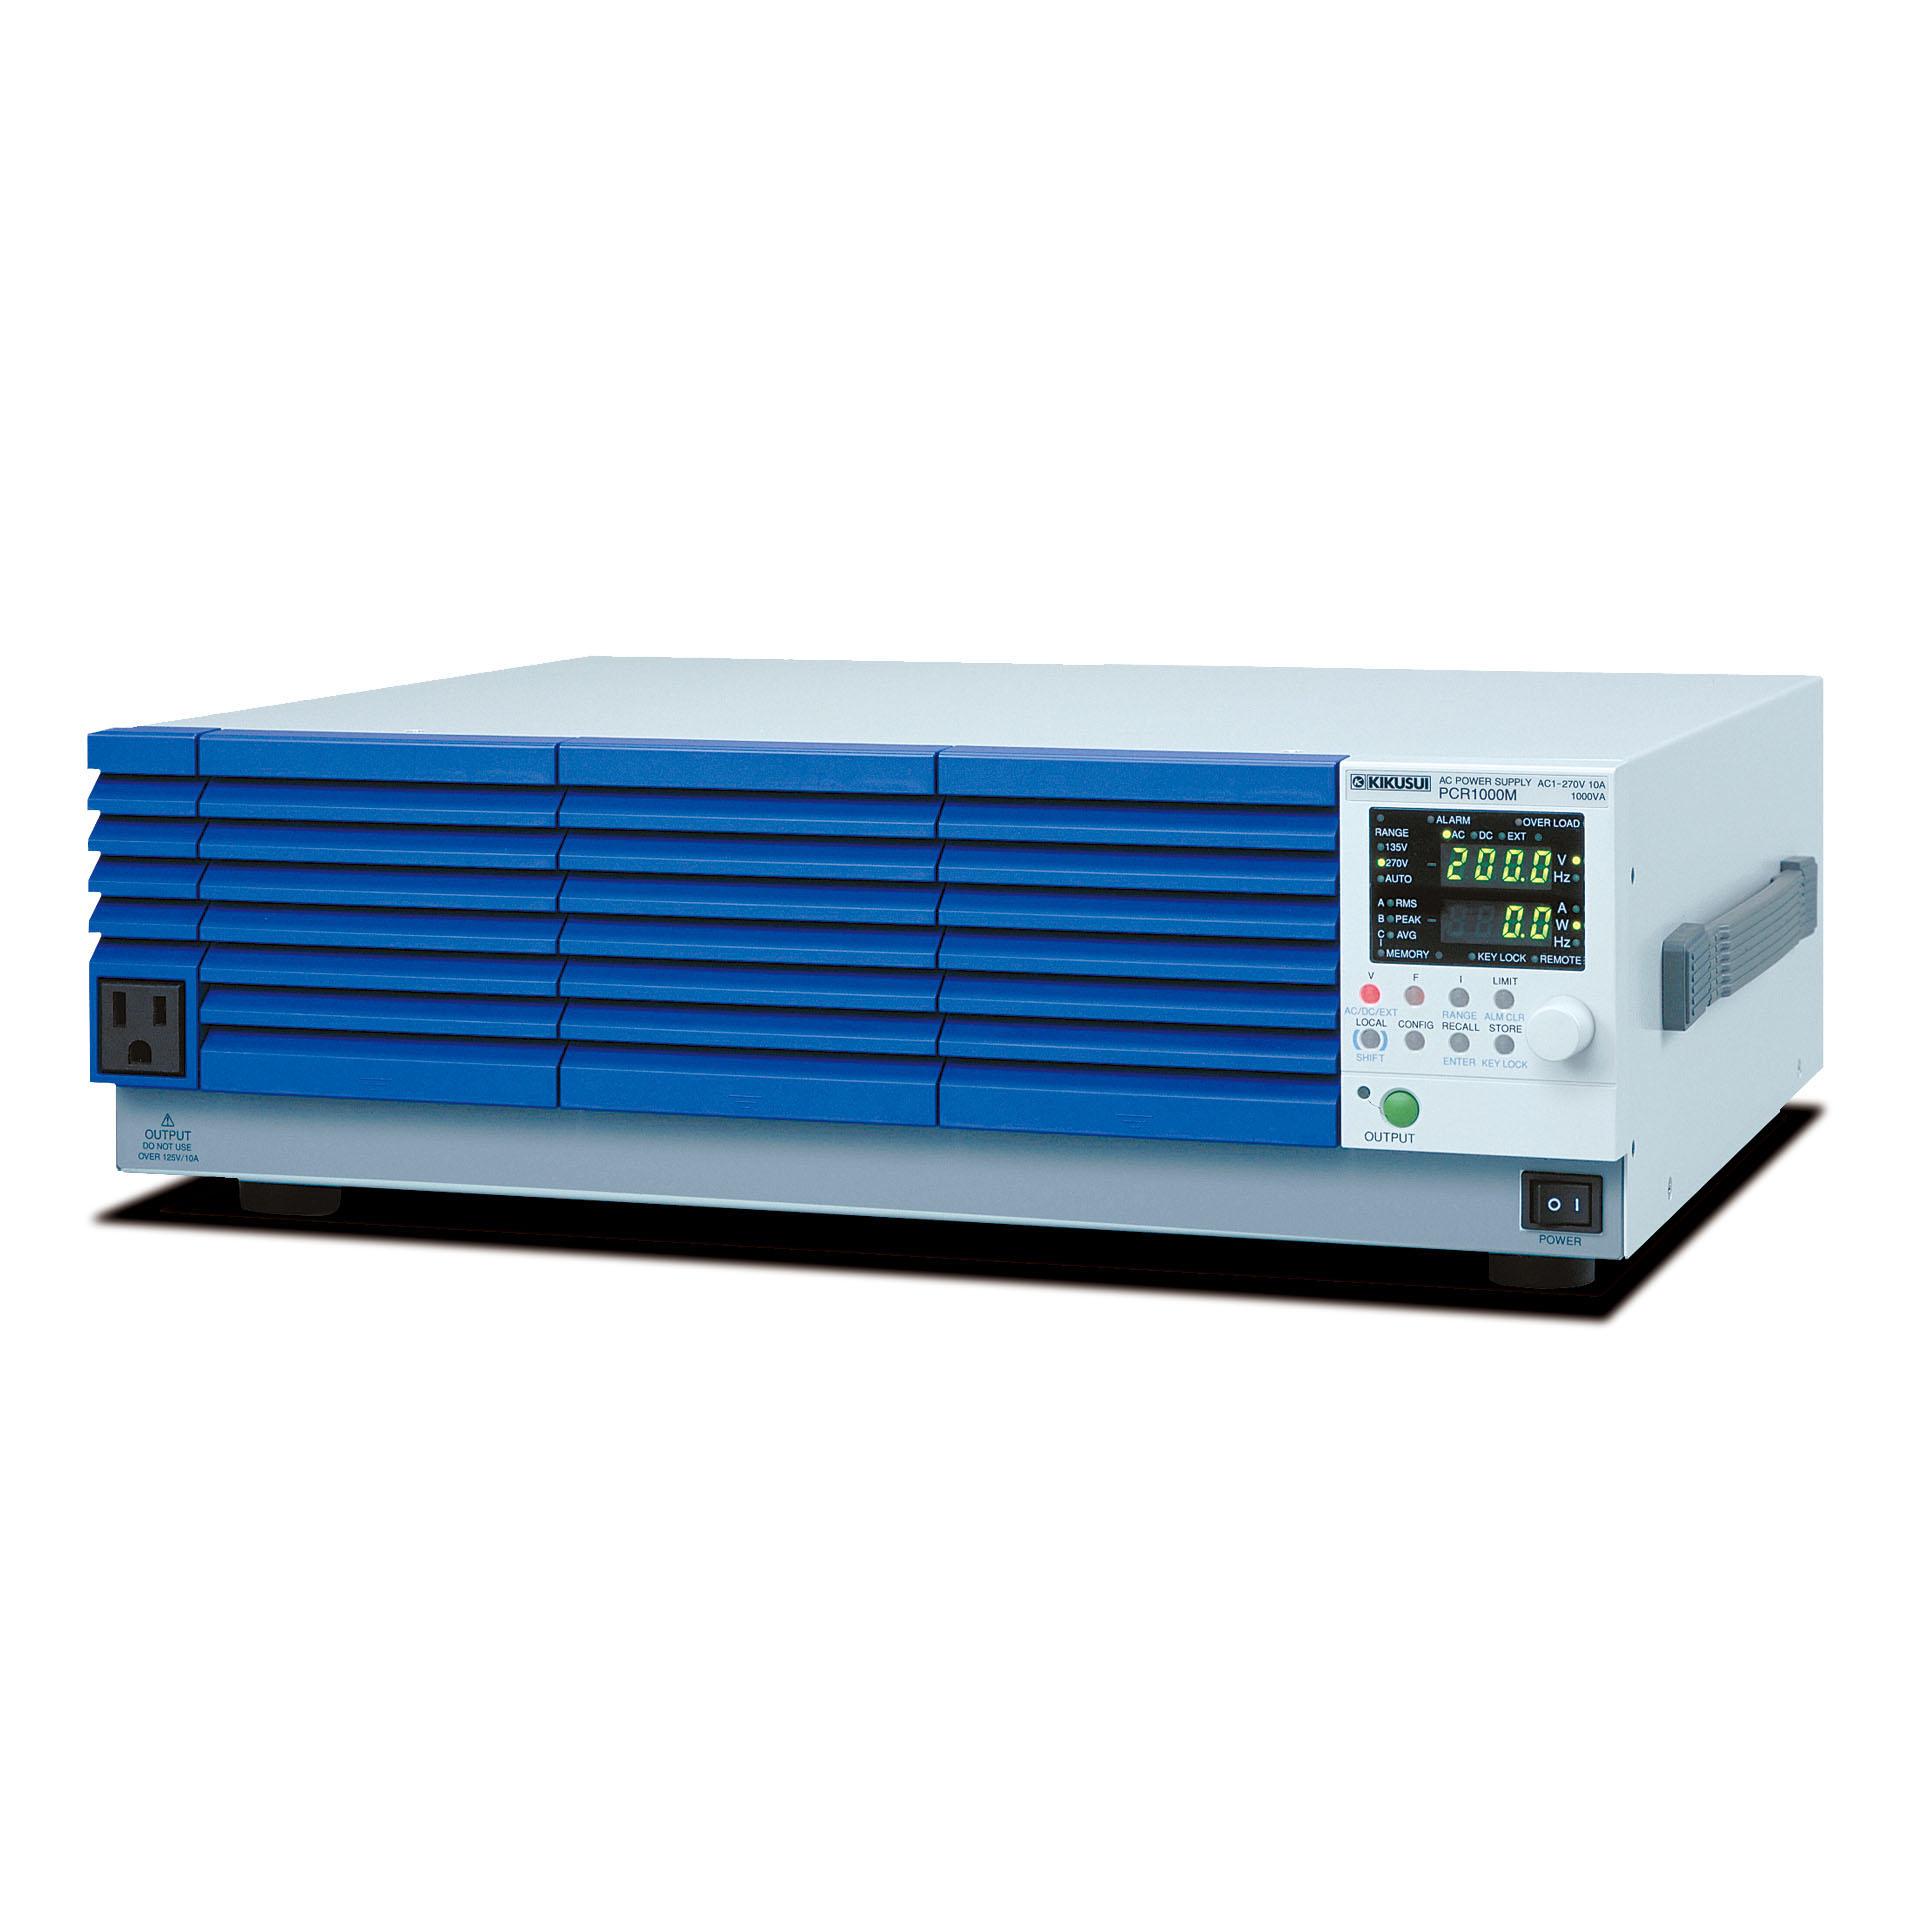 PCR1000M コンパクト交流電源